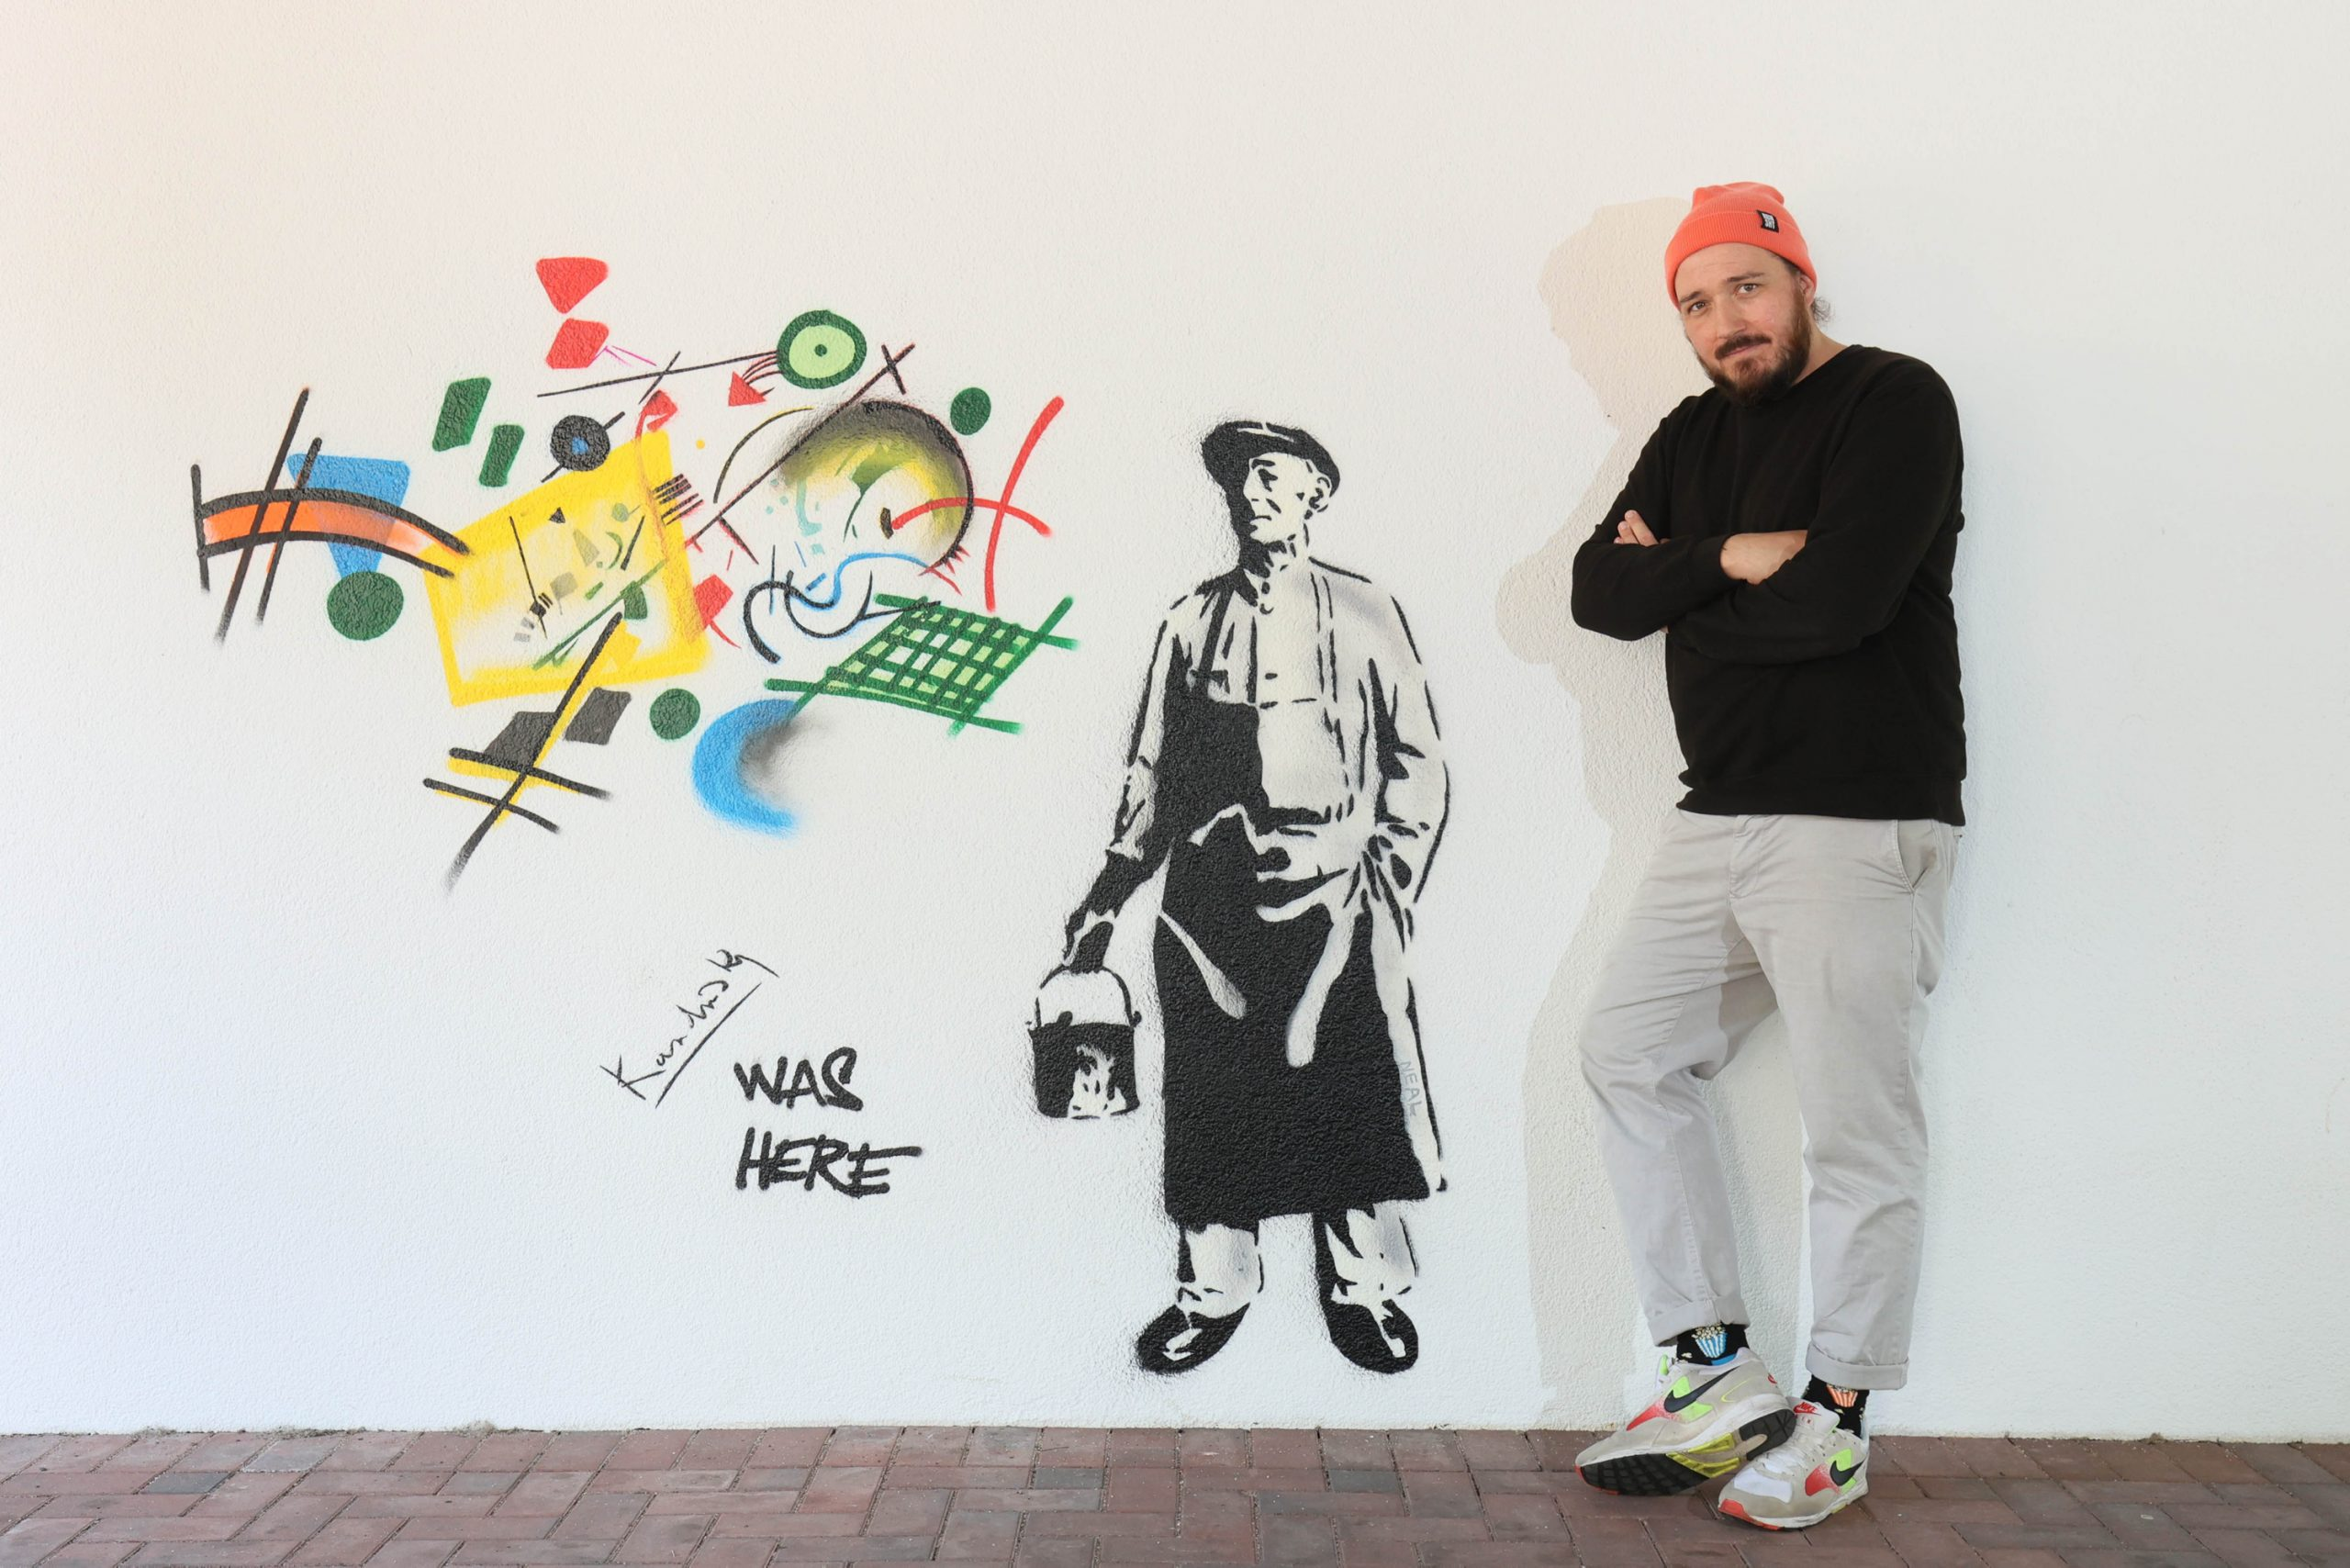 Rudolf Klöckner, Inhaber der Urbanshit Gallery